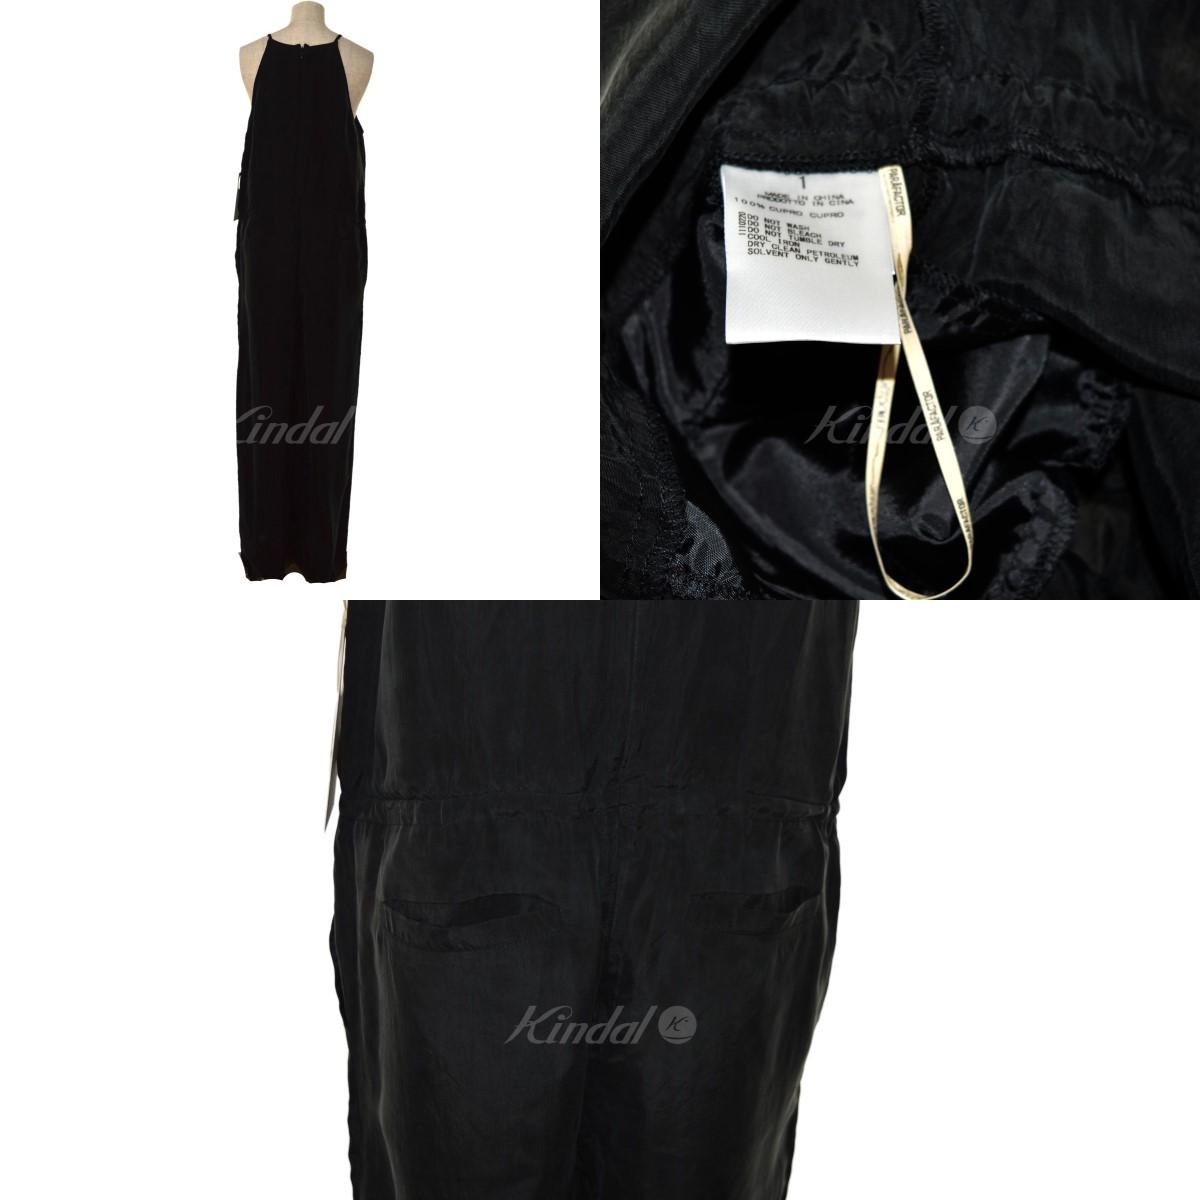 PARAFACTOR ノースリーブオールインワン ブラック サイズ 1100320パラファクターBrCoWxed